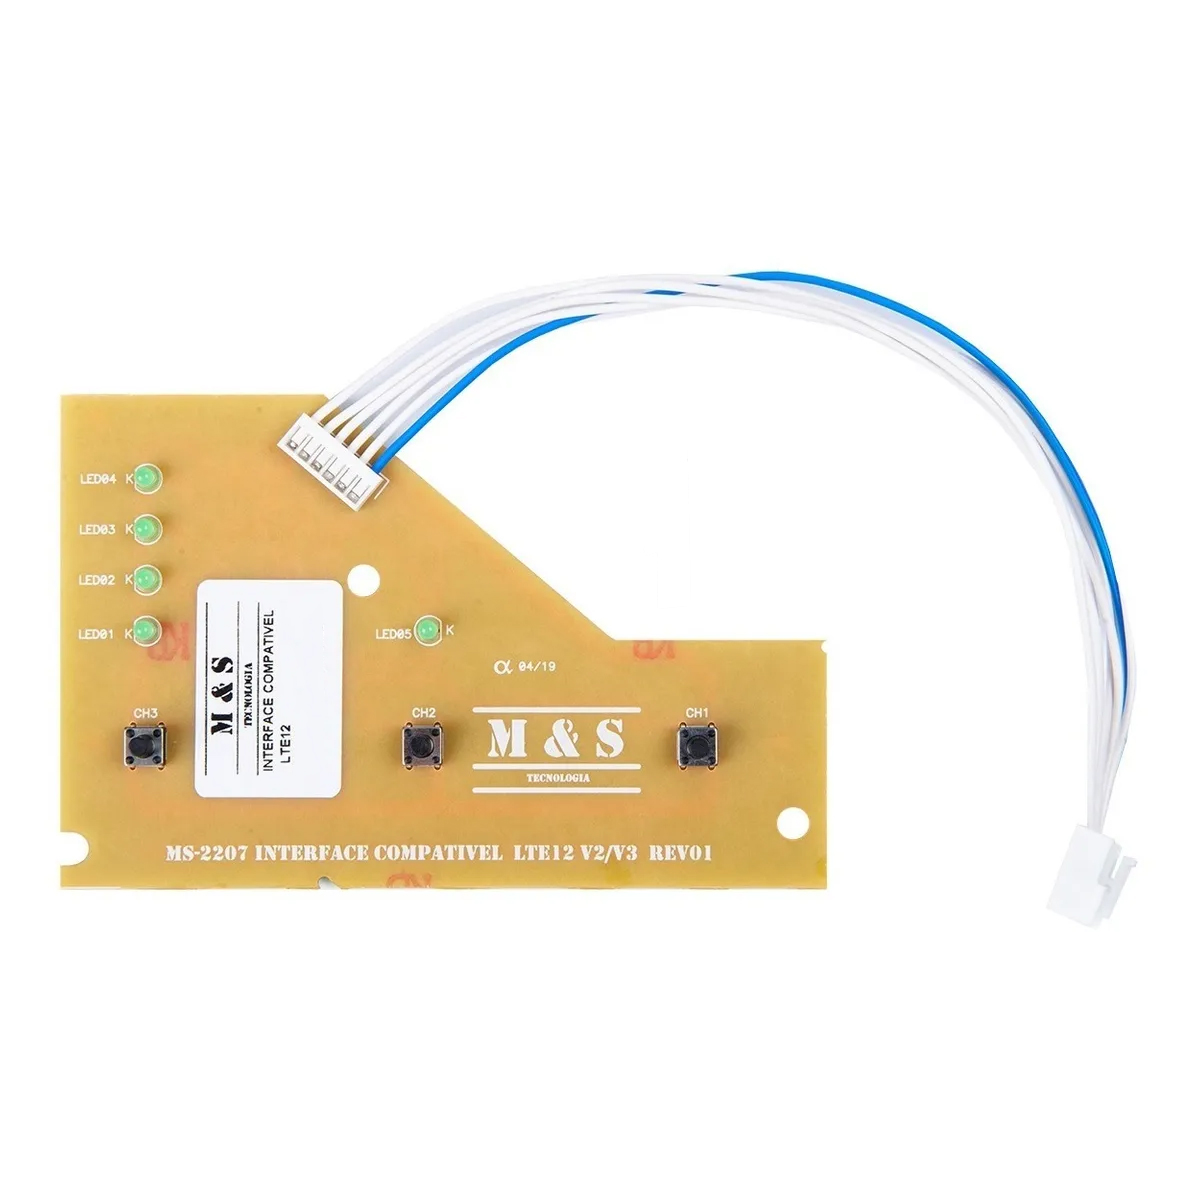 PLACA INTERFACE LAVADORA ELECTROLUX LTE12 64503081 LED AZUL M&S